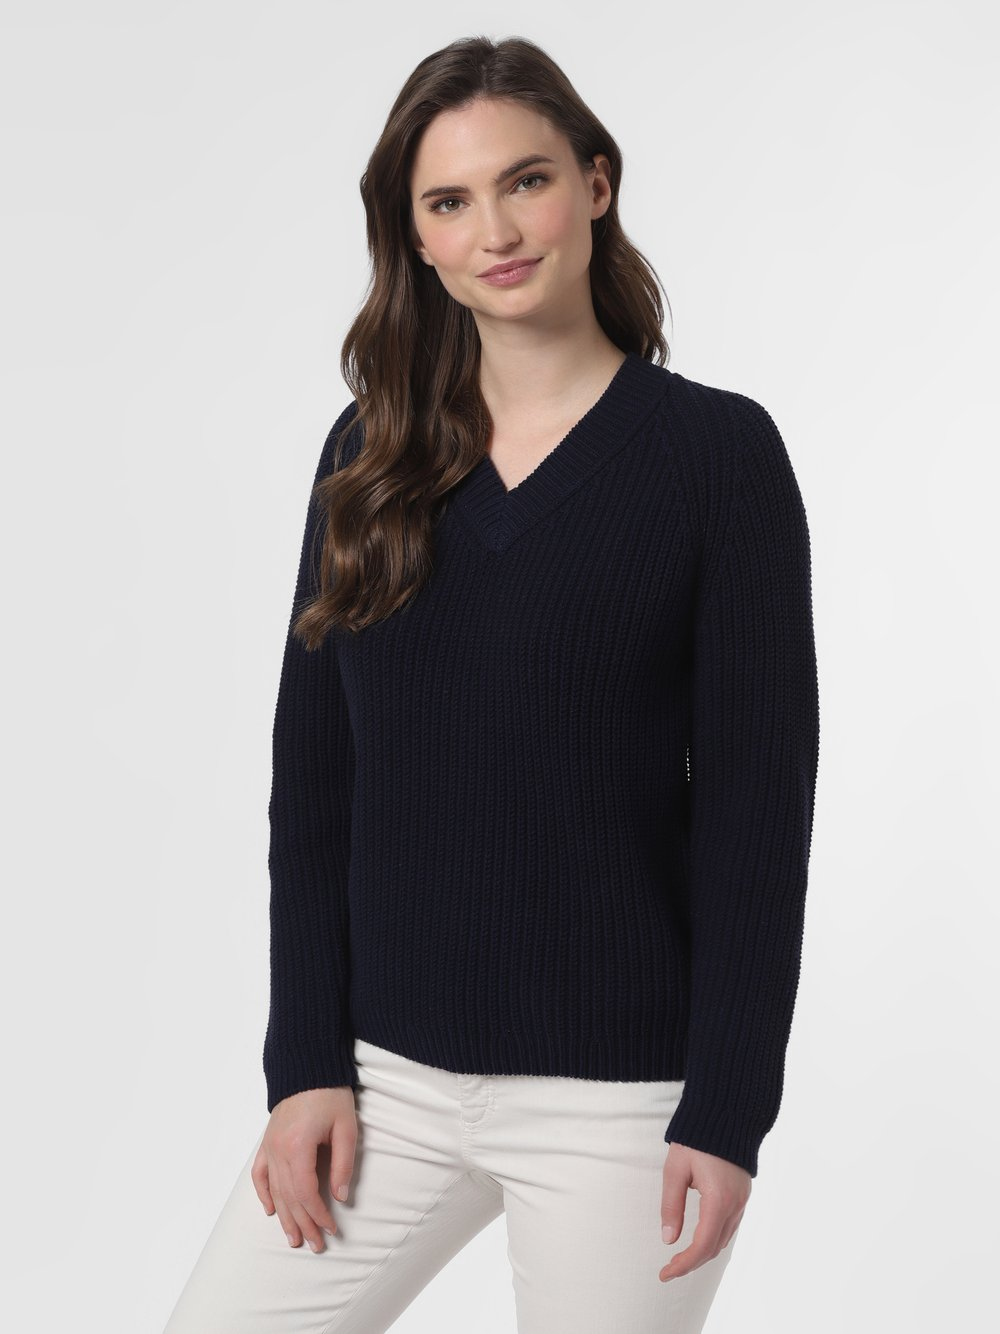 SvB Exquisit – Sweter damski, niebieski Van Graaf 461480-0001-00360